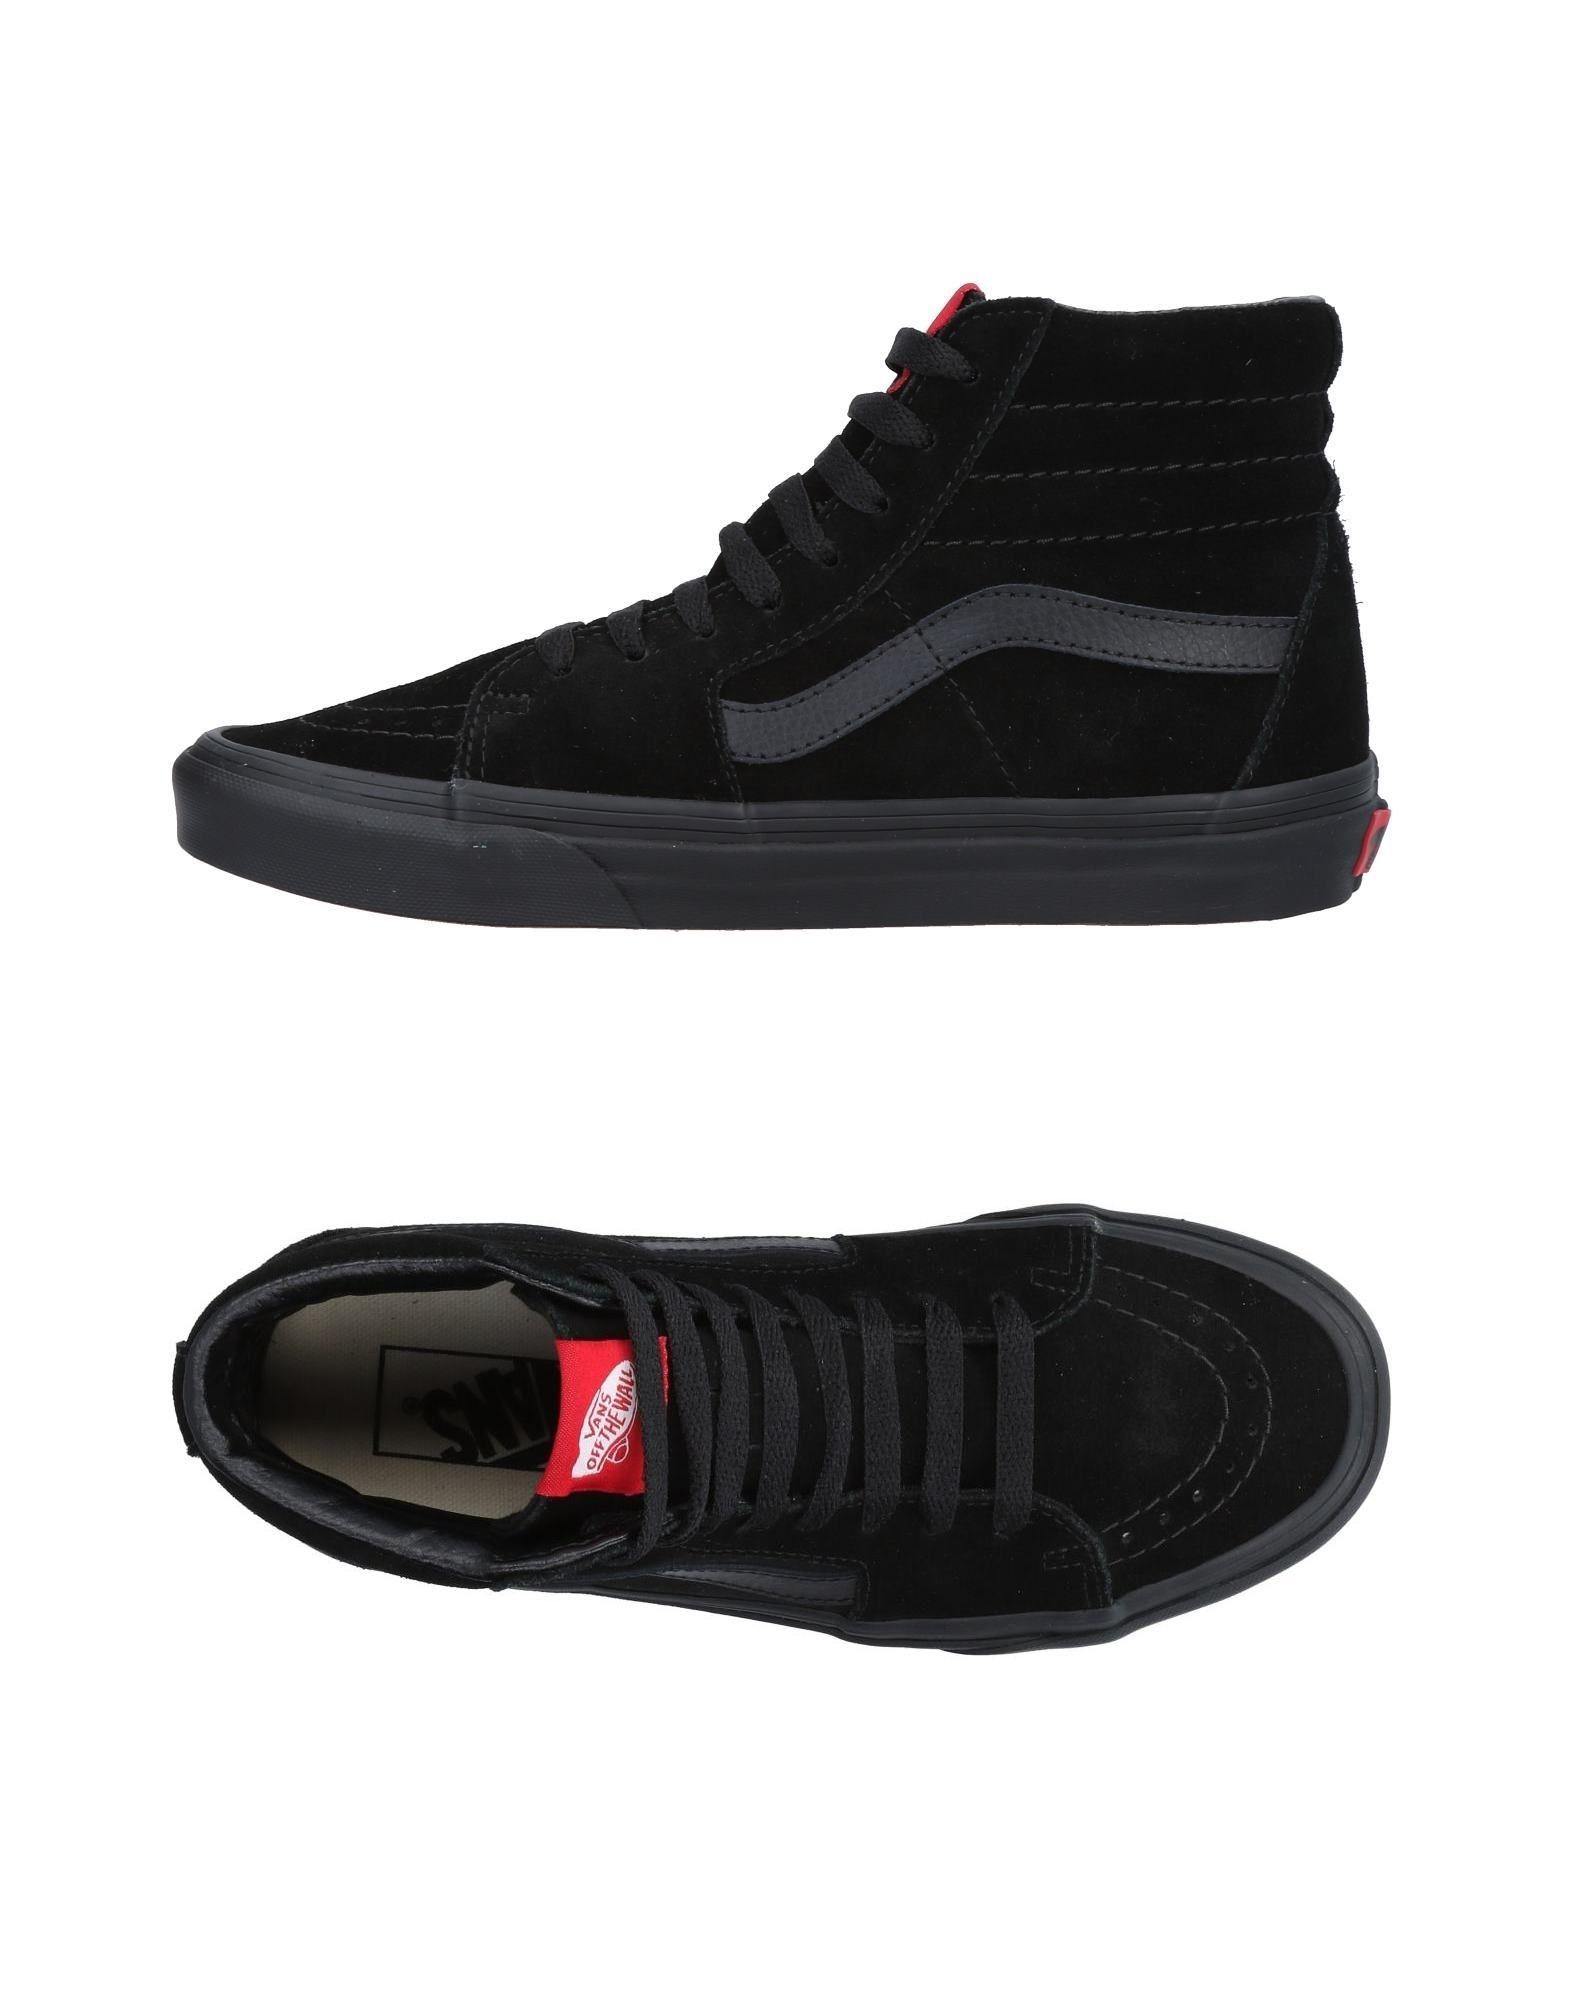 Vans Sneakers Damen  11494288CO Gute Qualität beliebte Schuhe